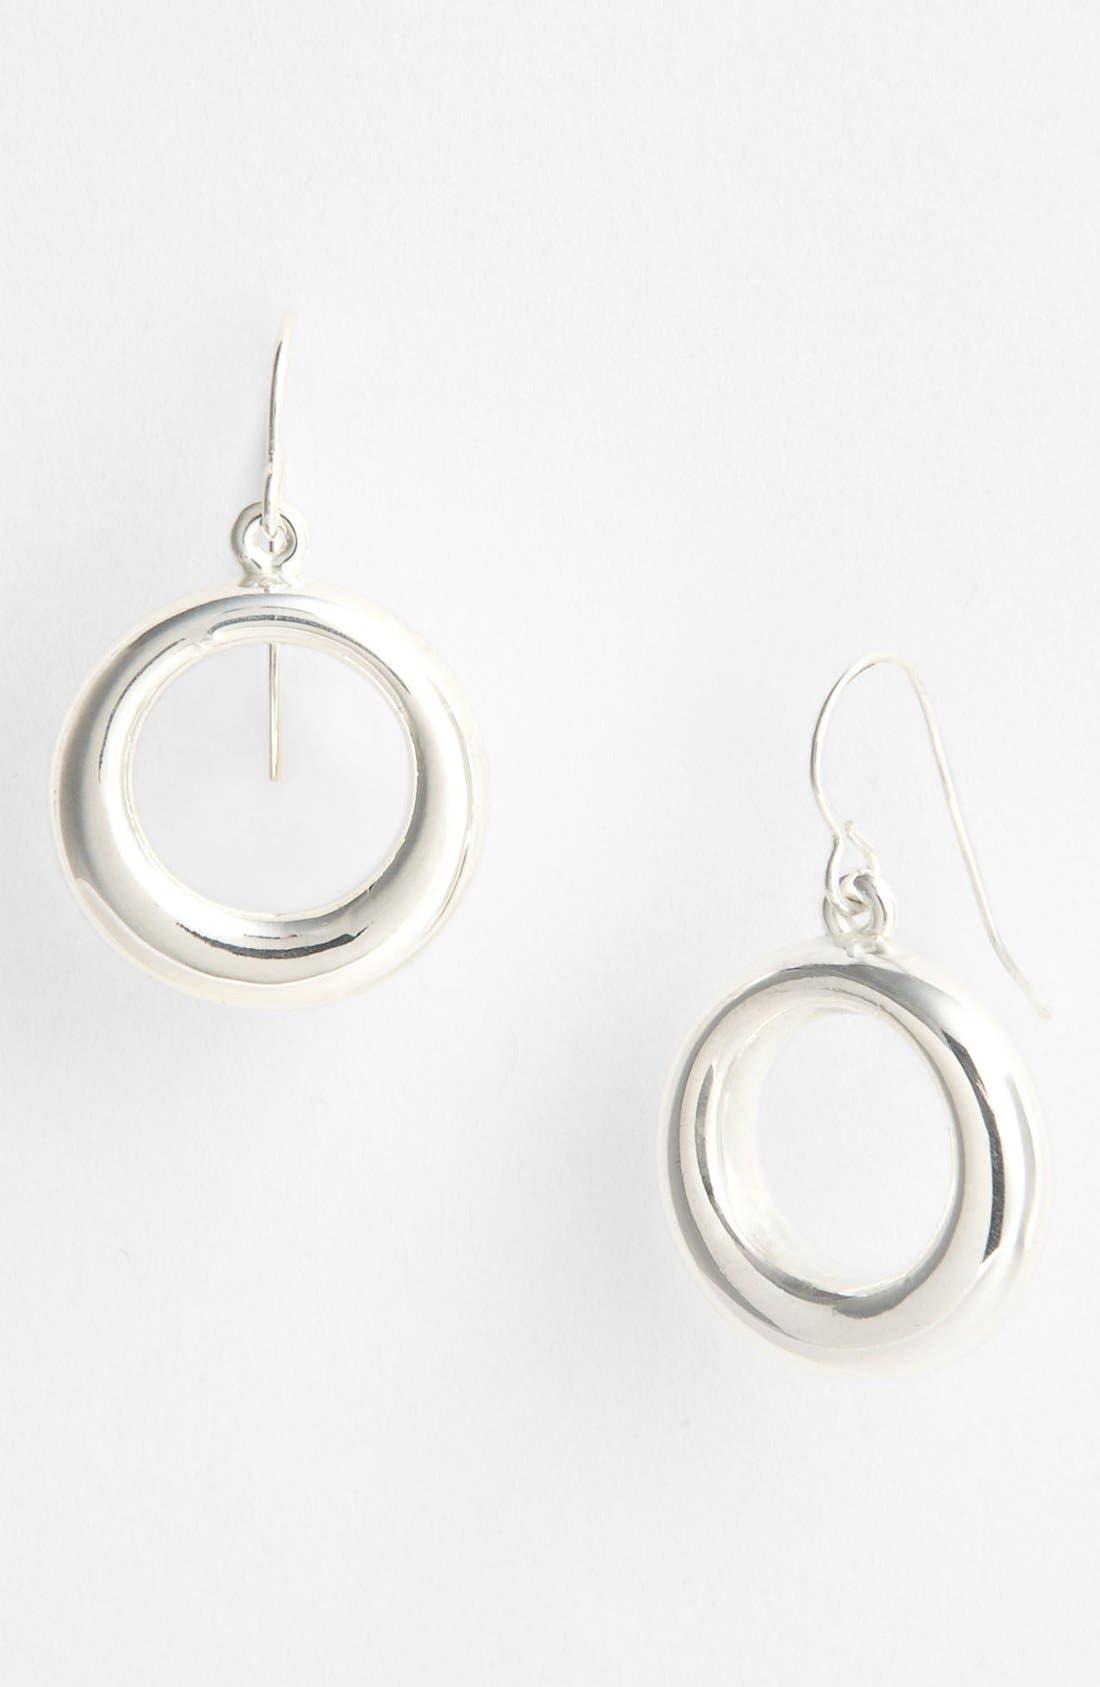 Alternate Image 1 Selected - Simon Sebbag 'Contemporary' Small Open Circle Drop Earrings